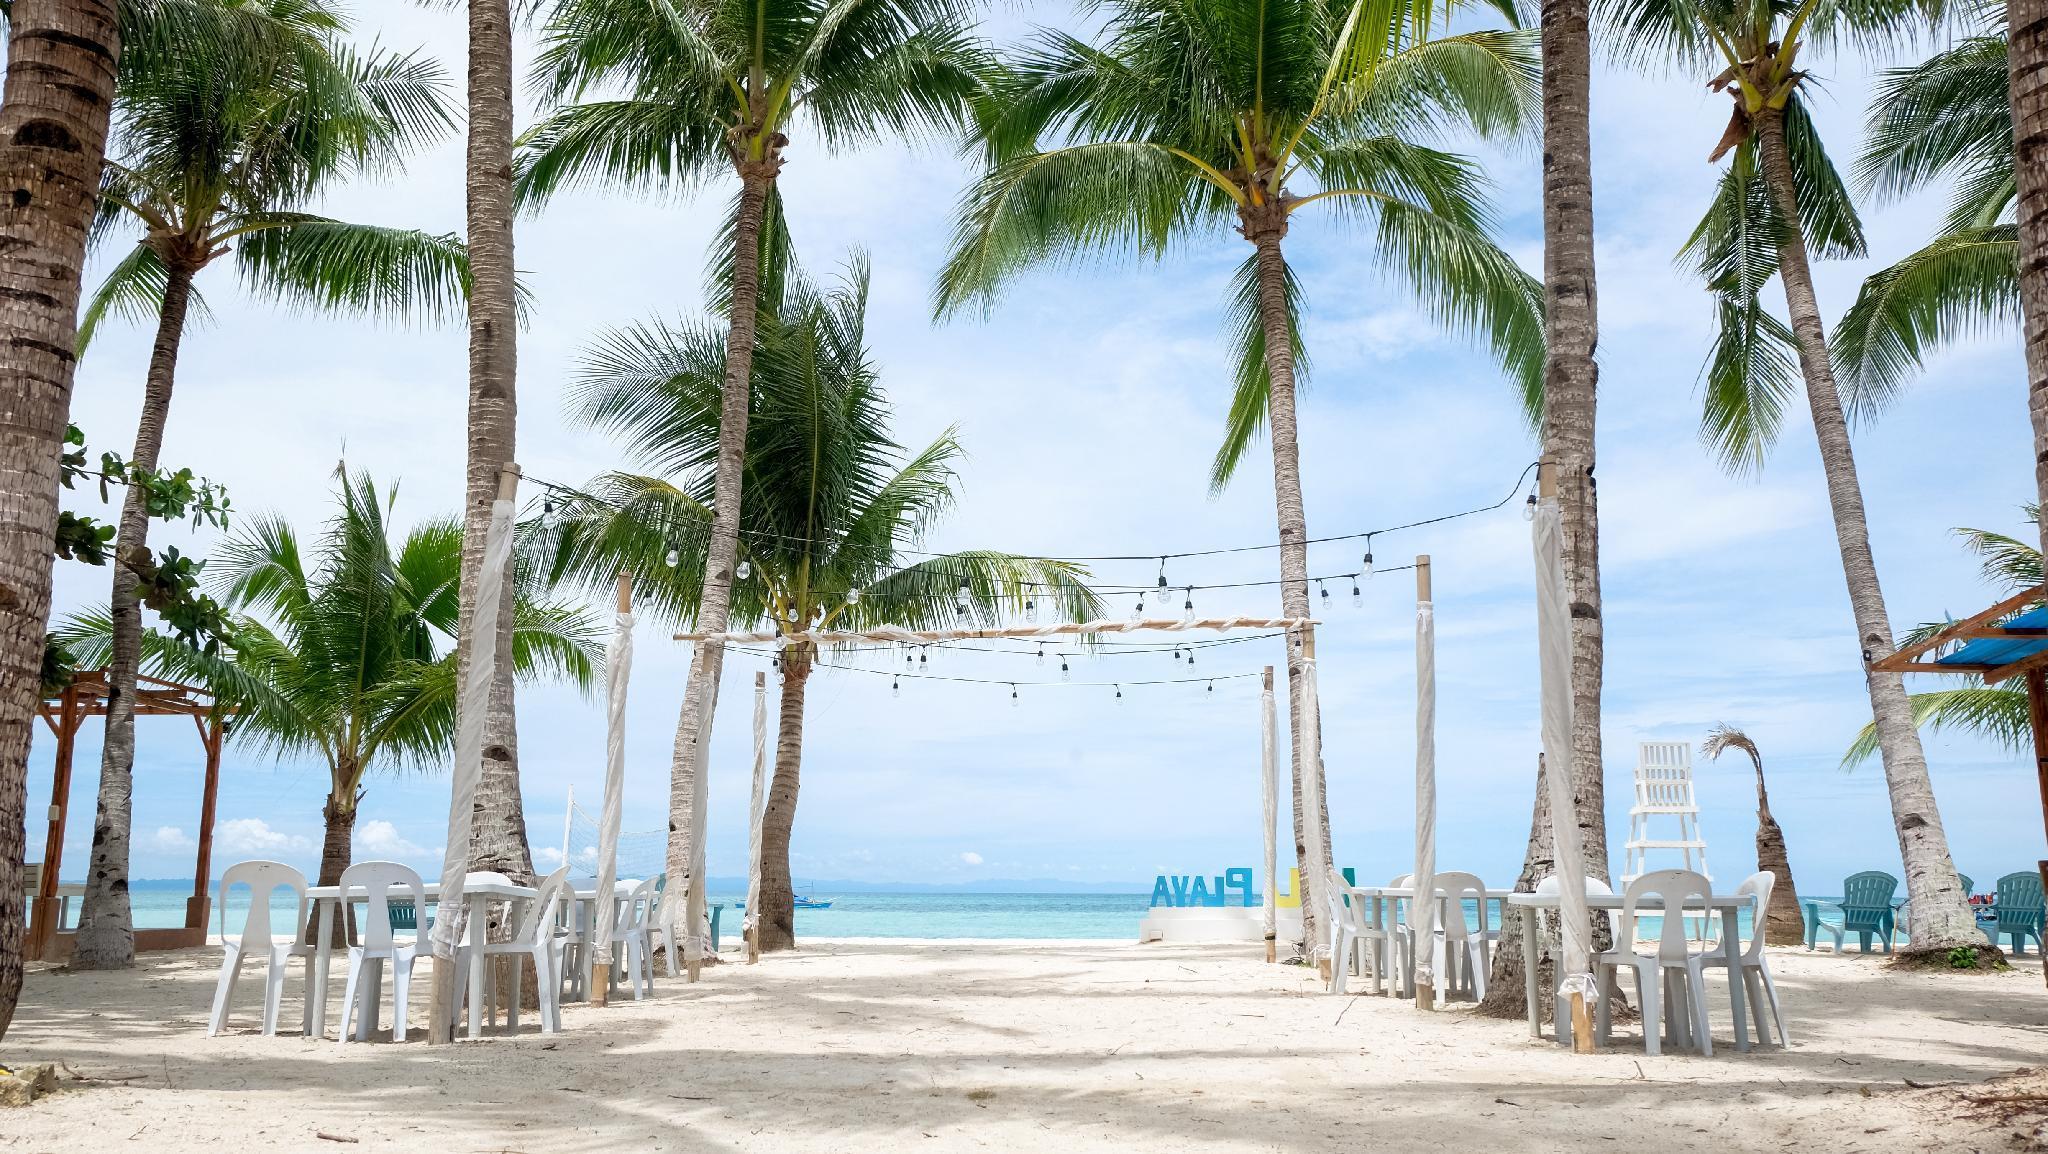 La Playa Estrella Beach Resort, Santa Fe